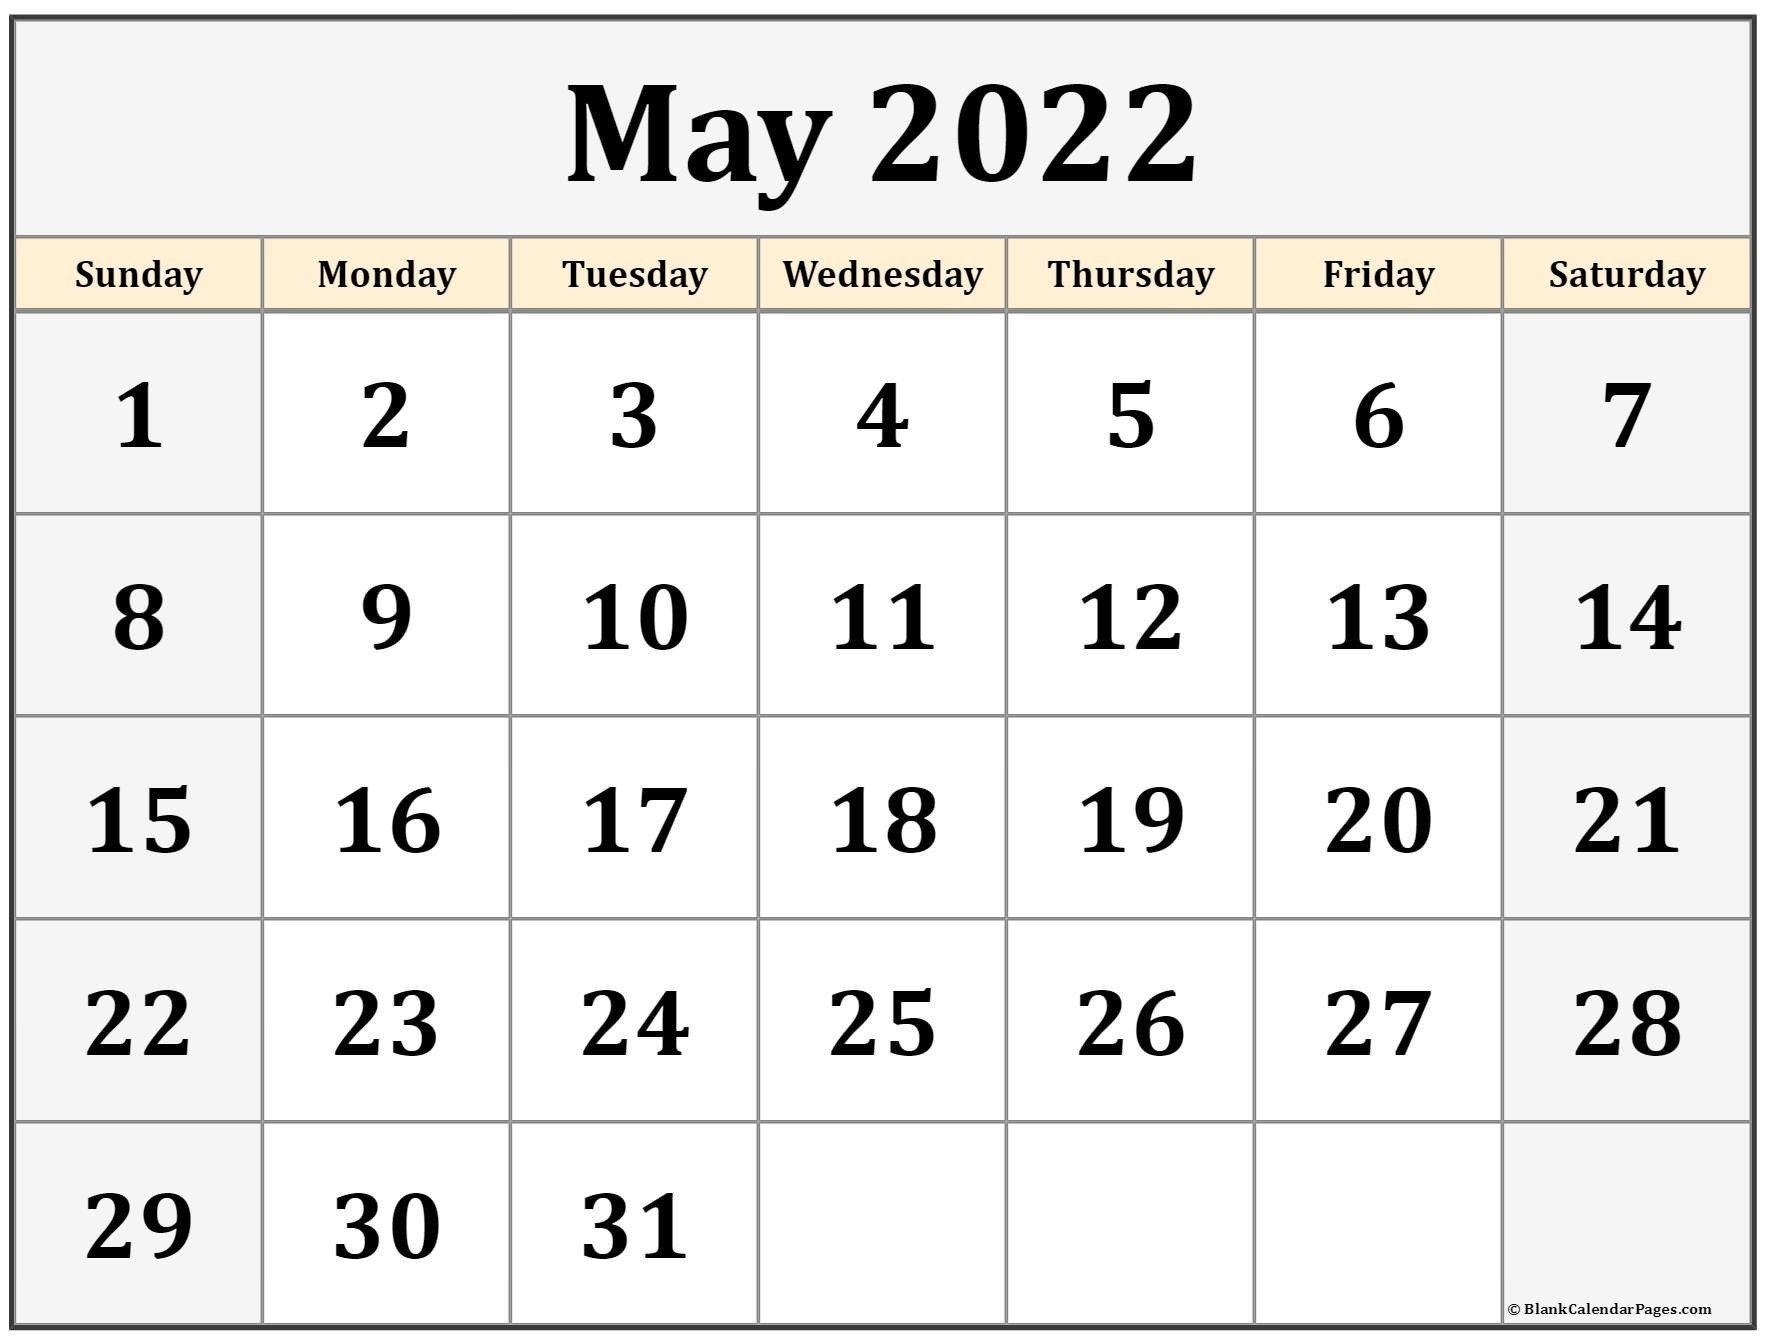 May 2022 Calendar Printable | Free Printable Calendar Monthly throughout Printable Calendar May 2022